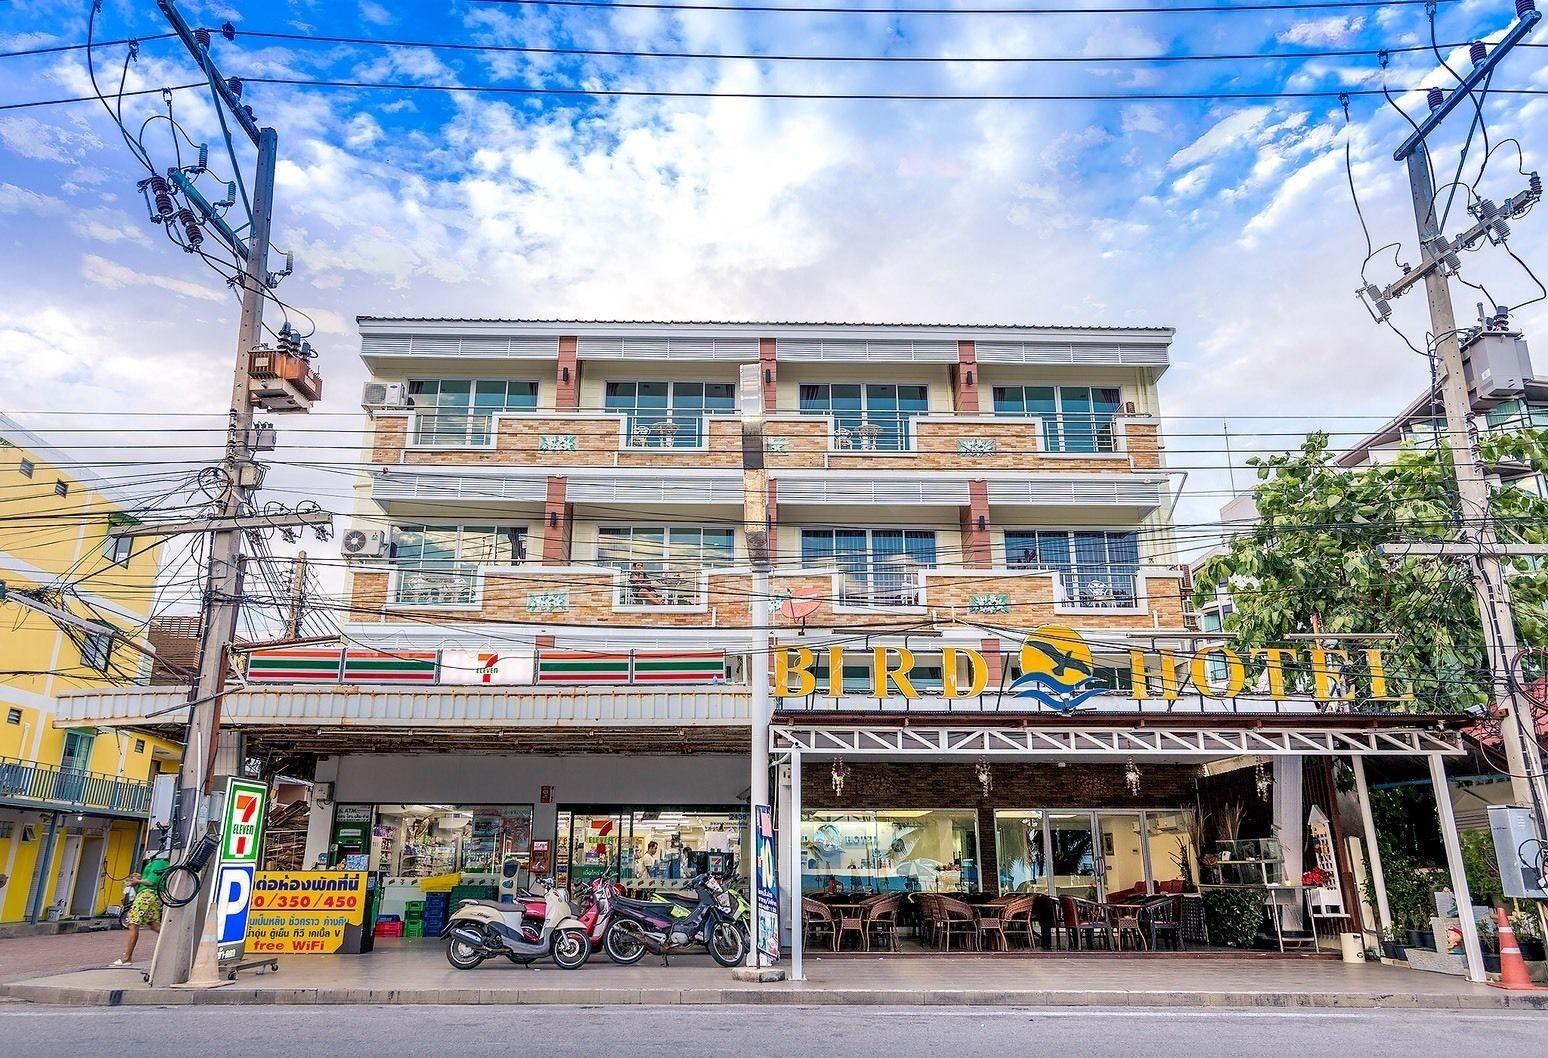 Bird Hotel, Pattaya